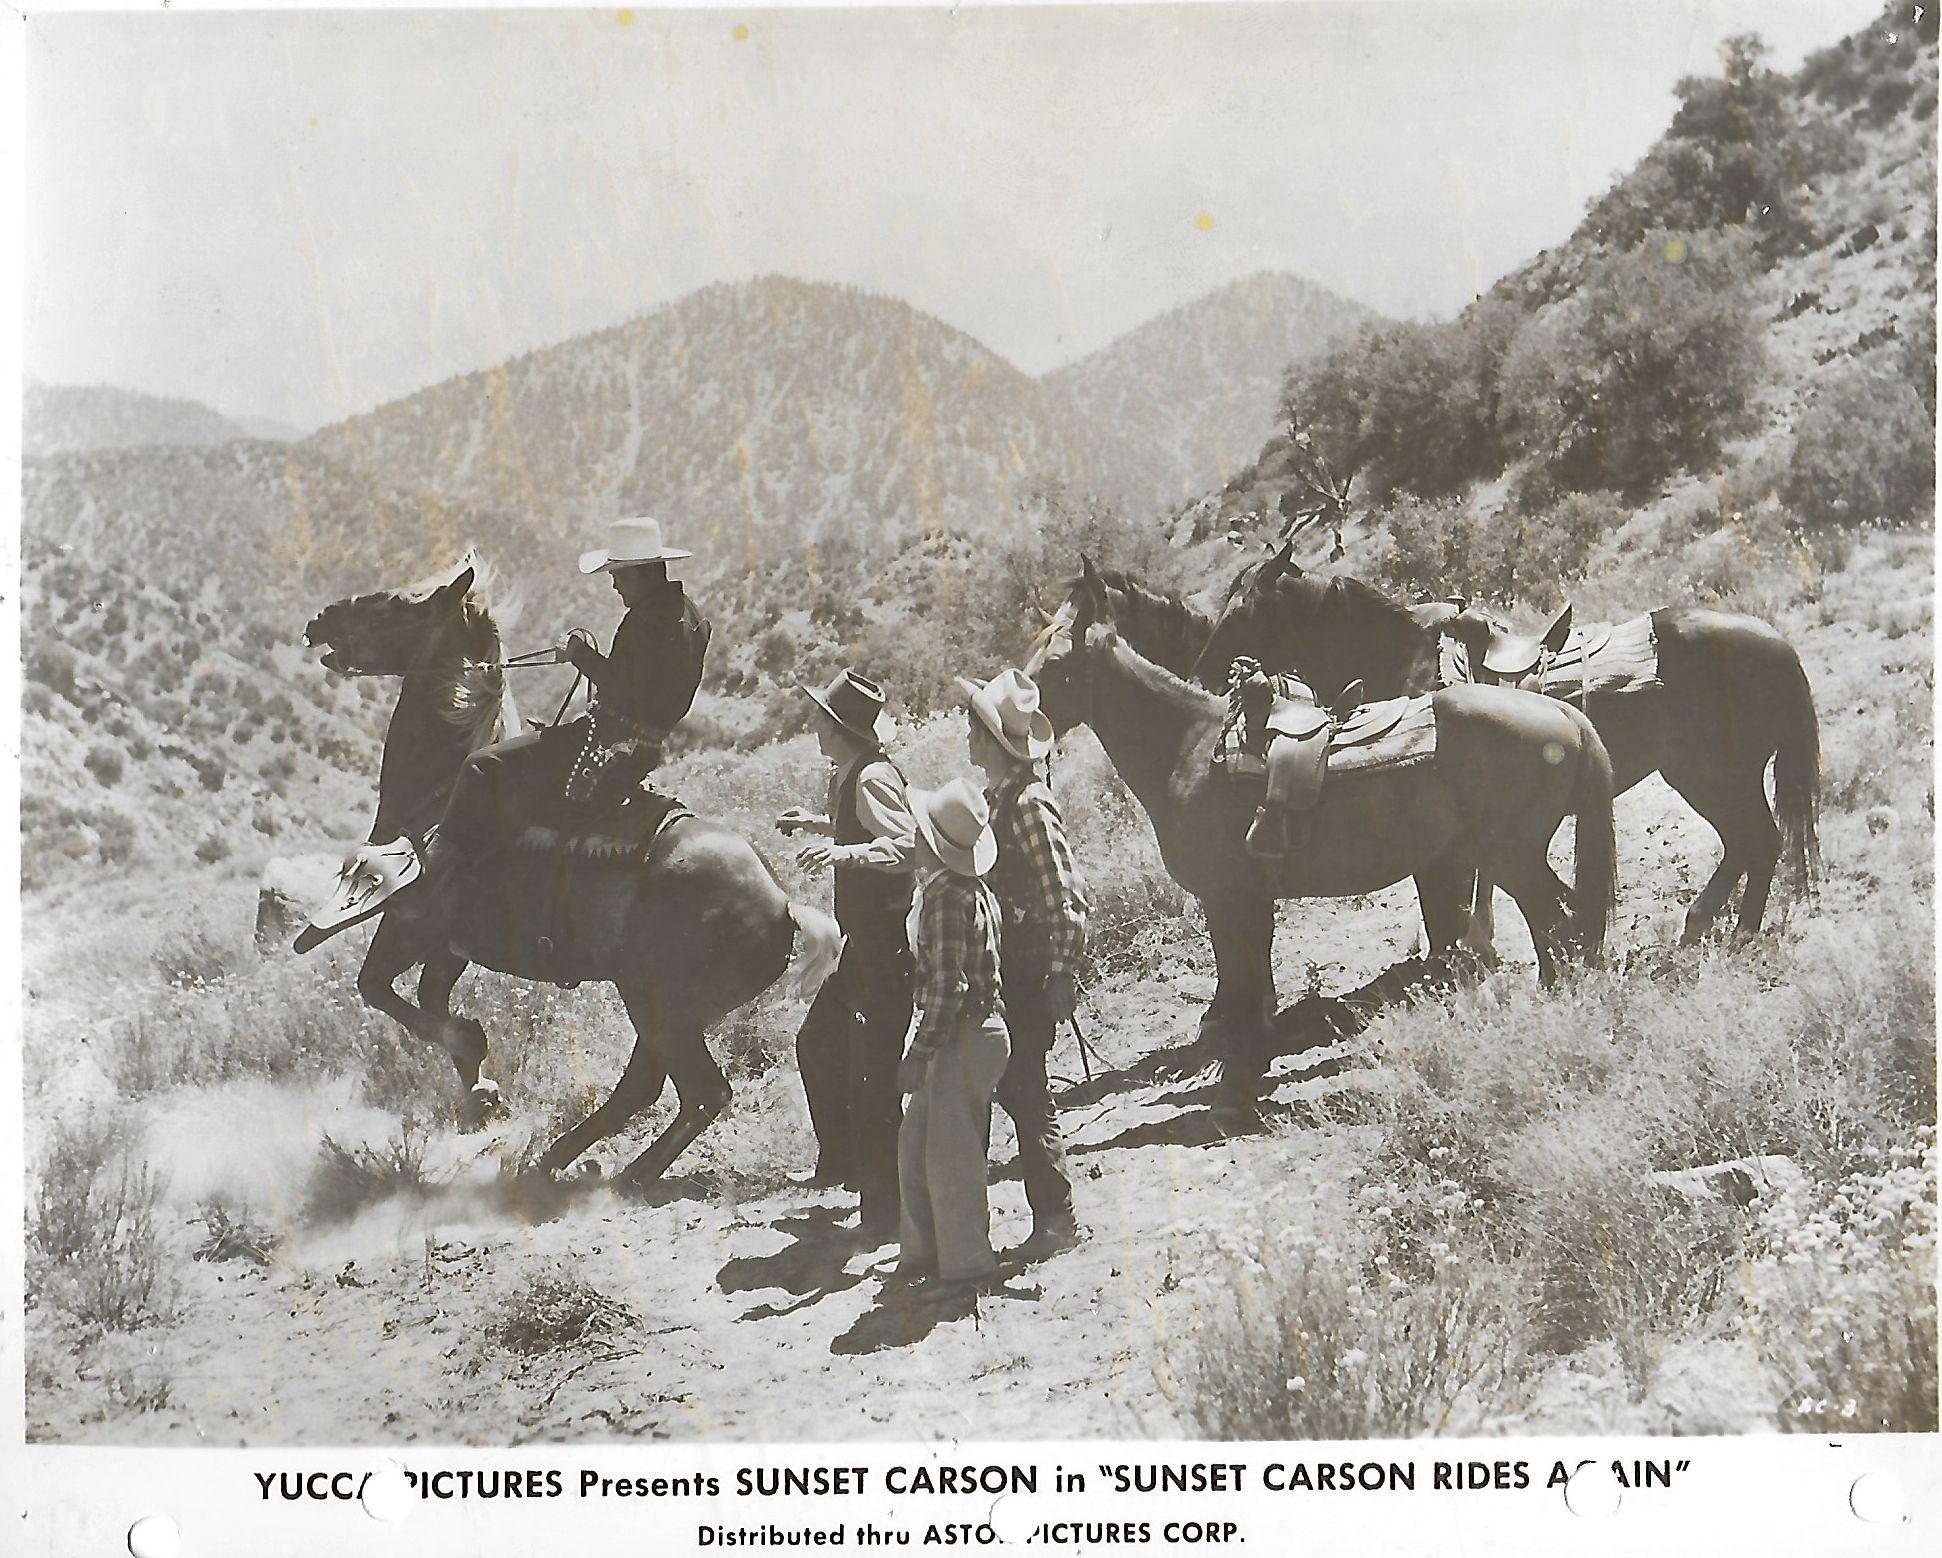 Sunset Carson, Joe Hiser, and Dan White in Sunset Carson Rides Again (1948)